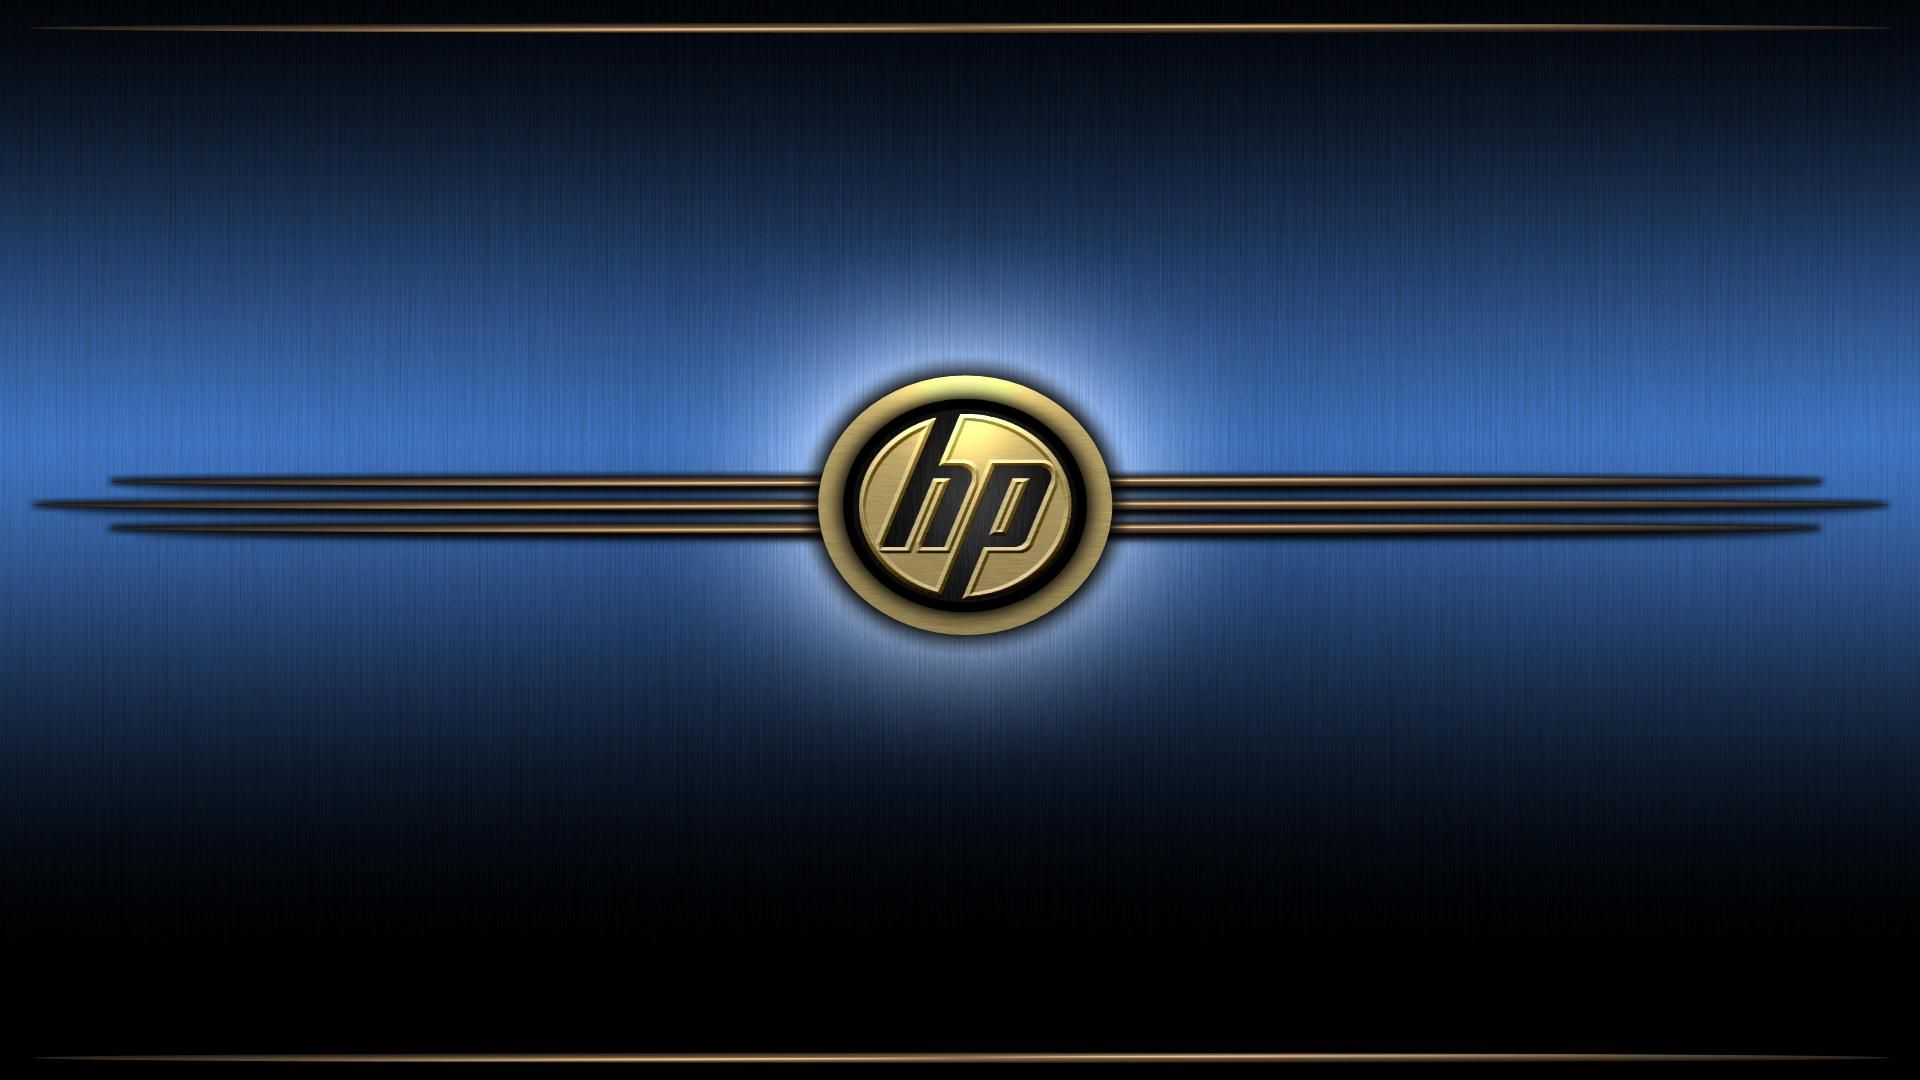 Hp Laptop Wallpaper 4k 1920x1080 Download Hd Wallpaper Wallpapertip